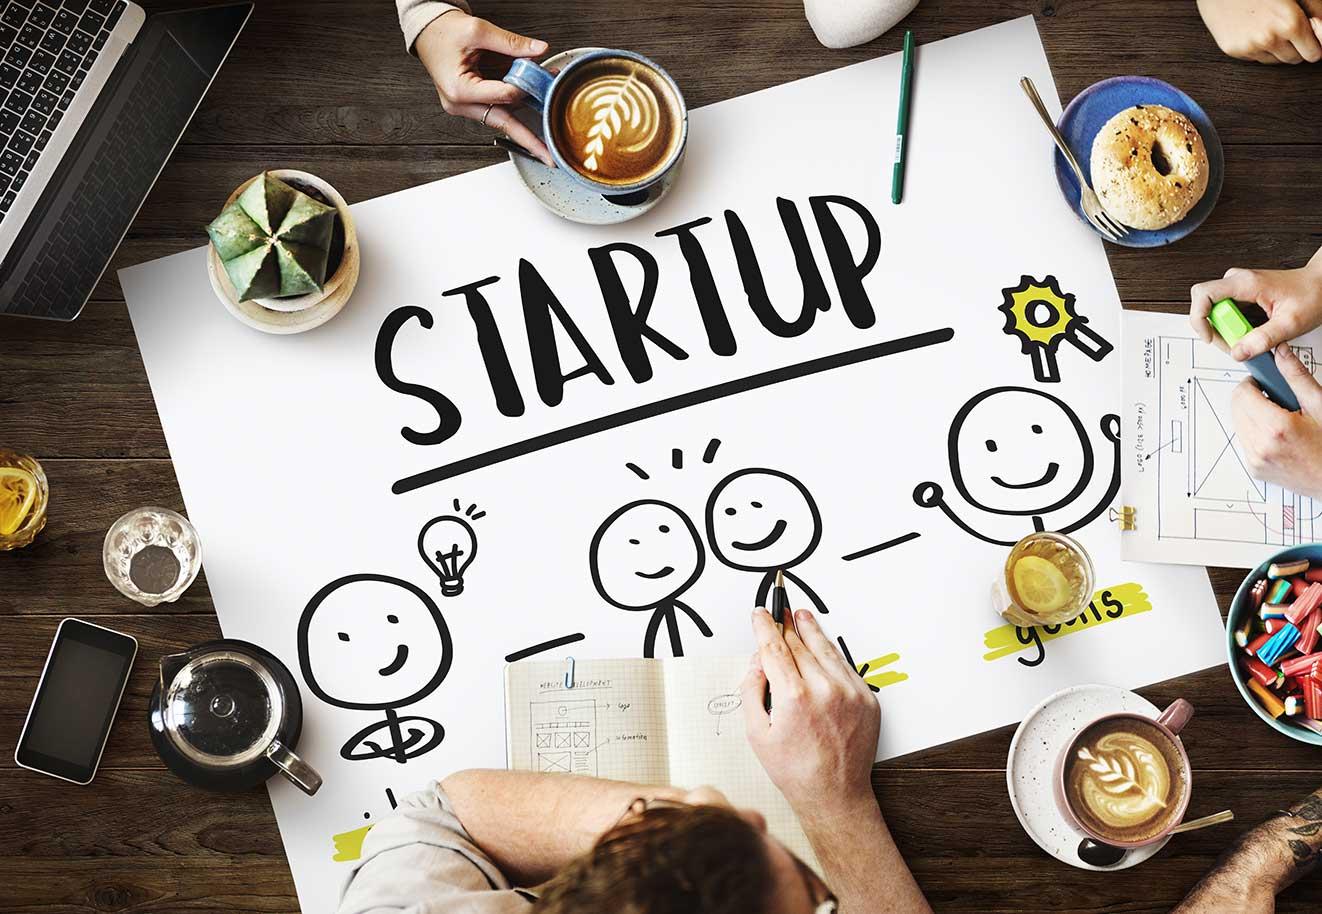 5 myths about startups